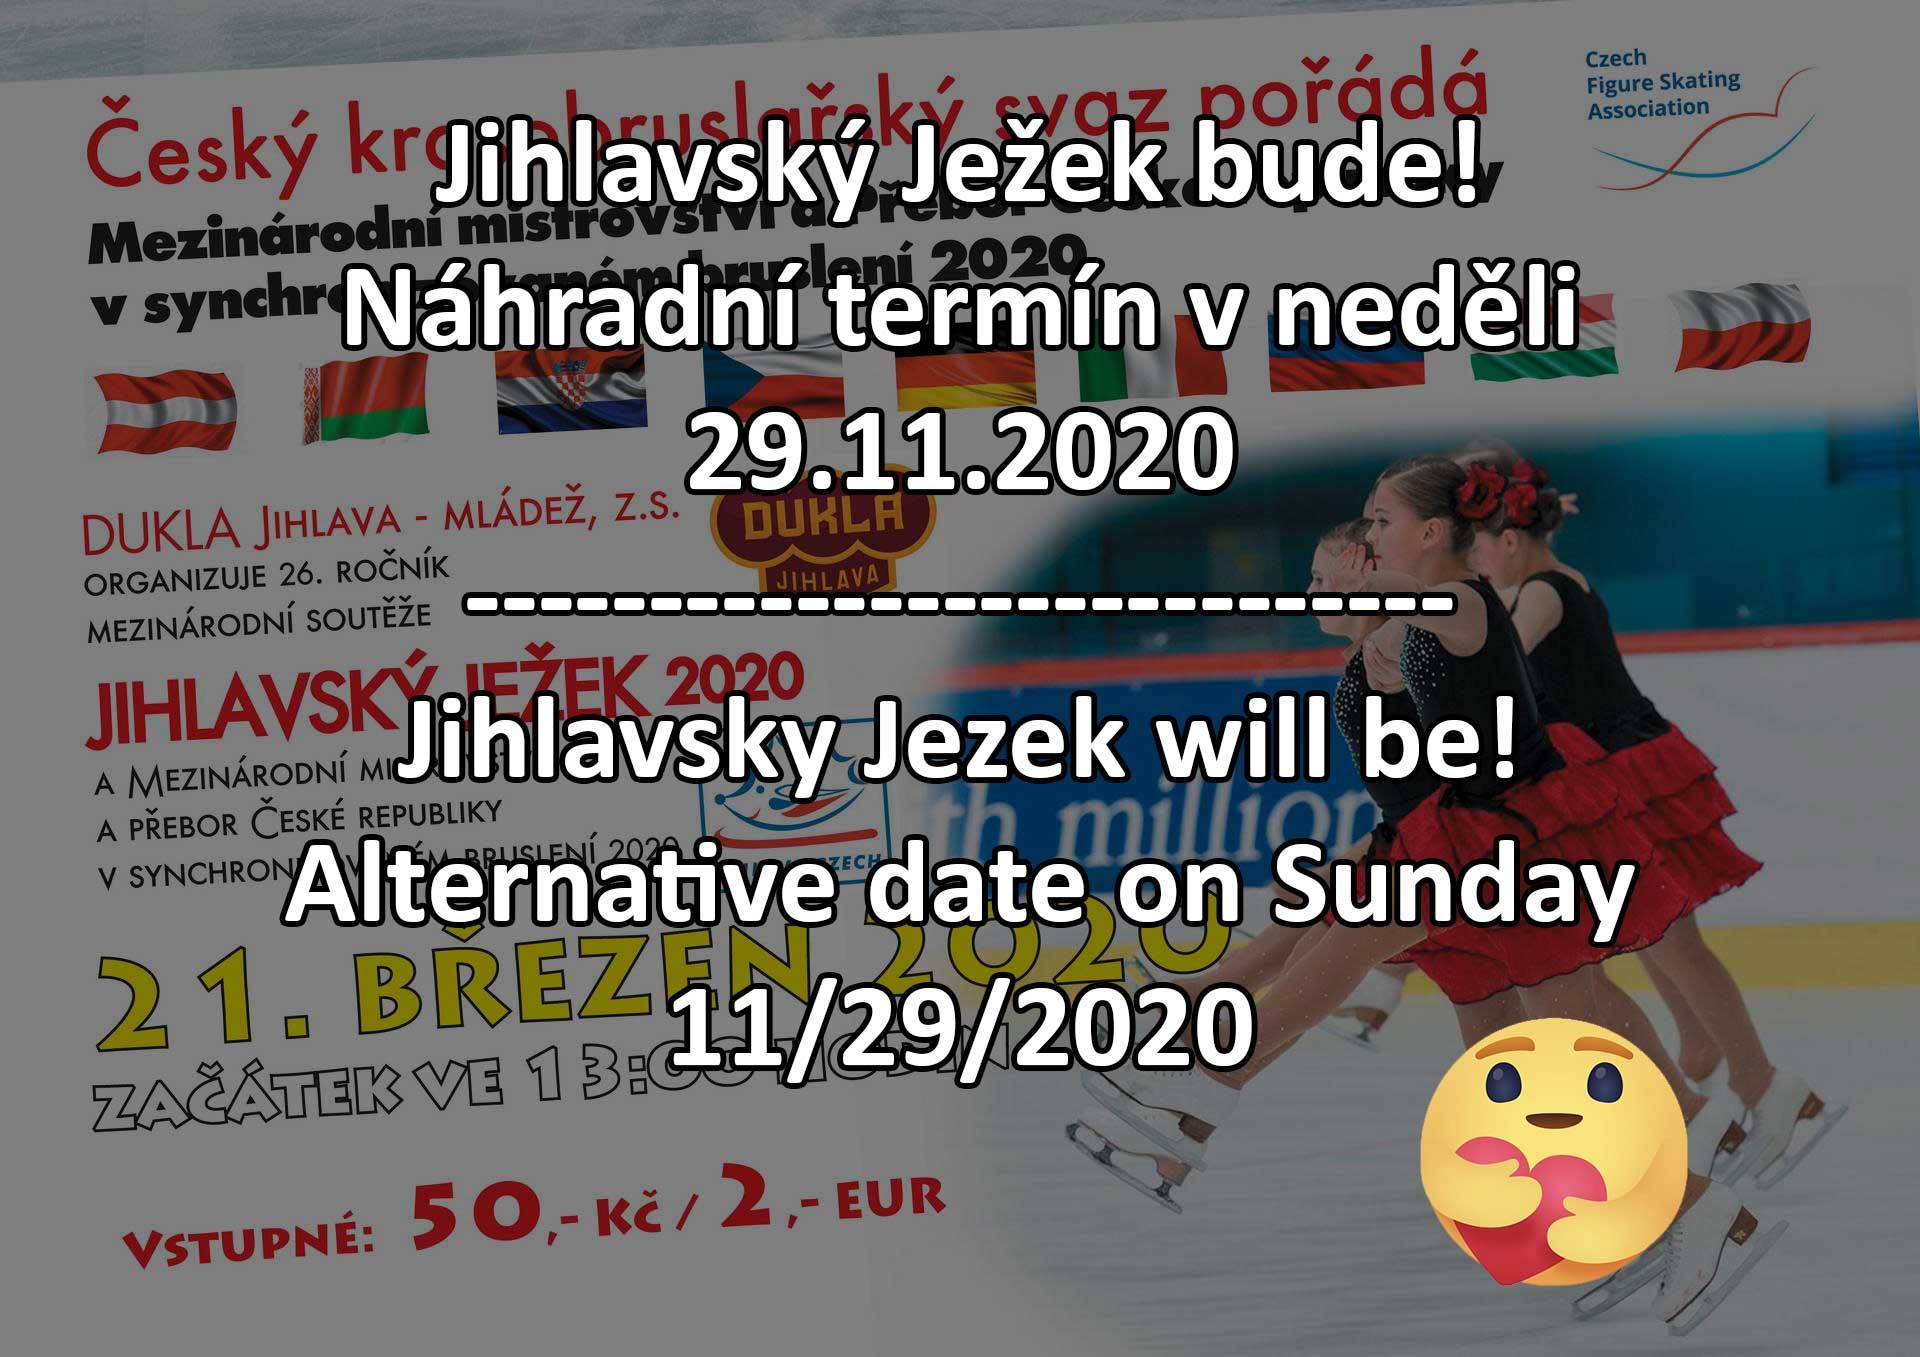 plakat Jihlavsky Jezek 2020 alternative